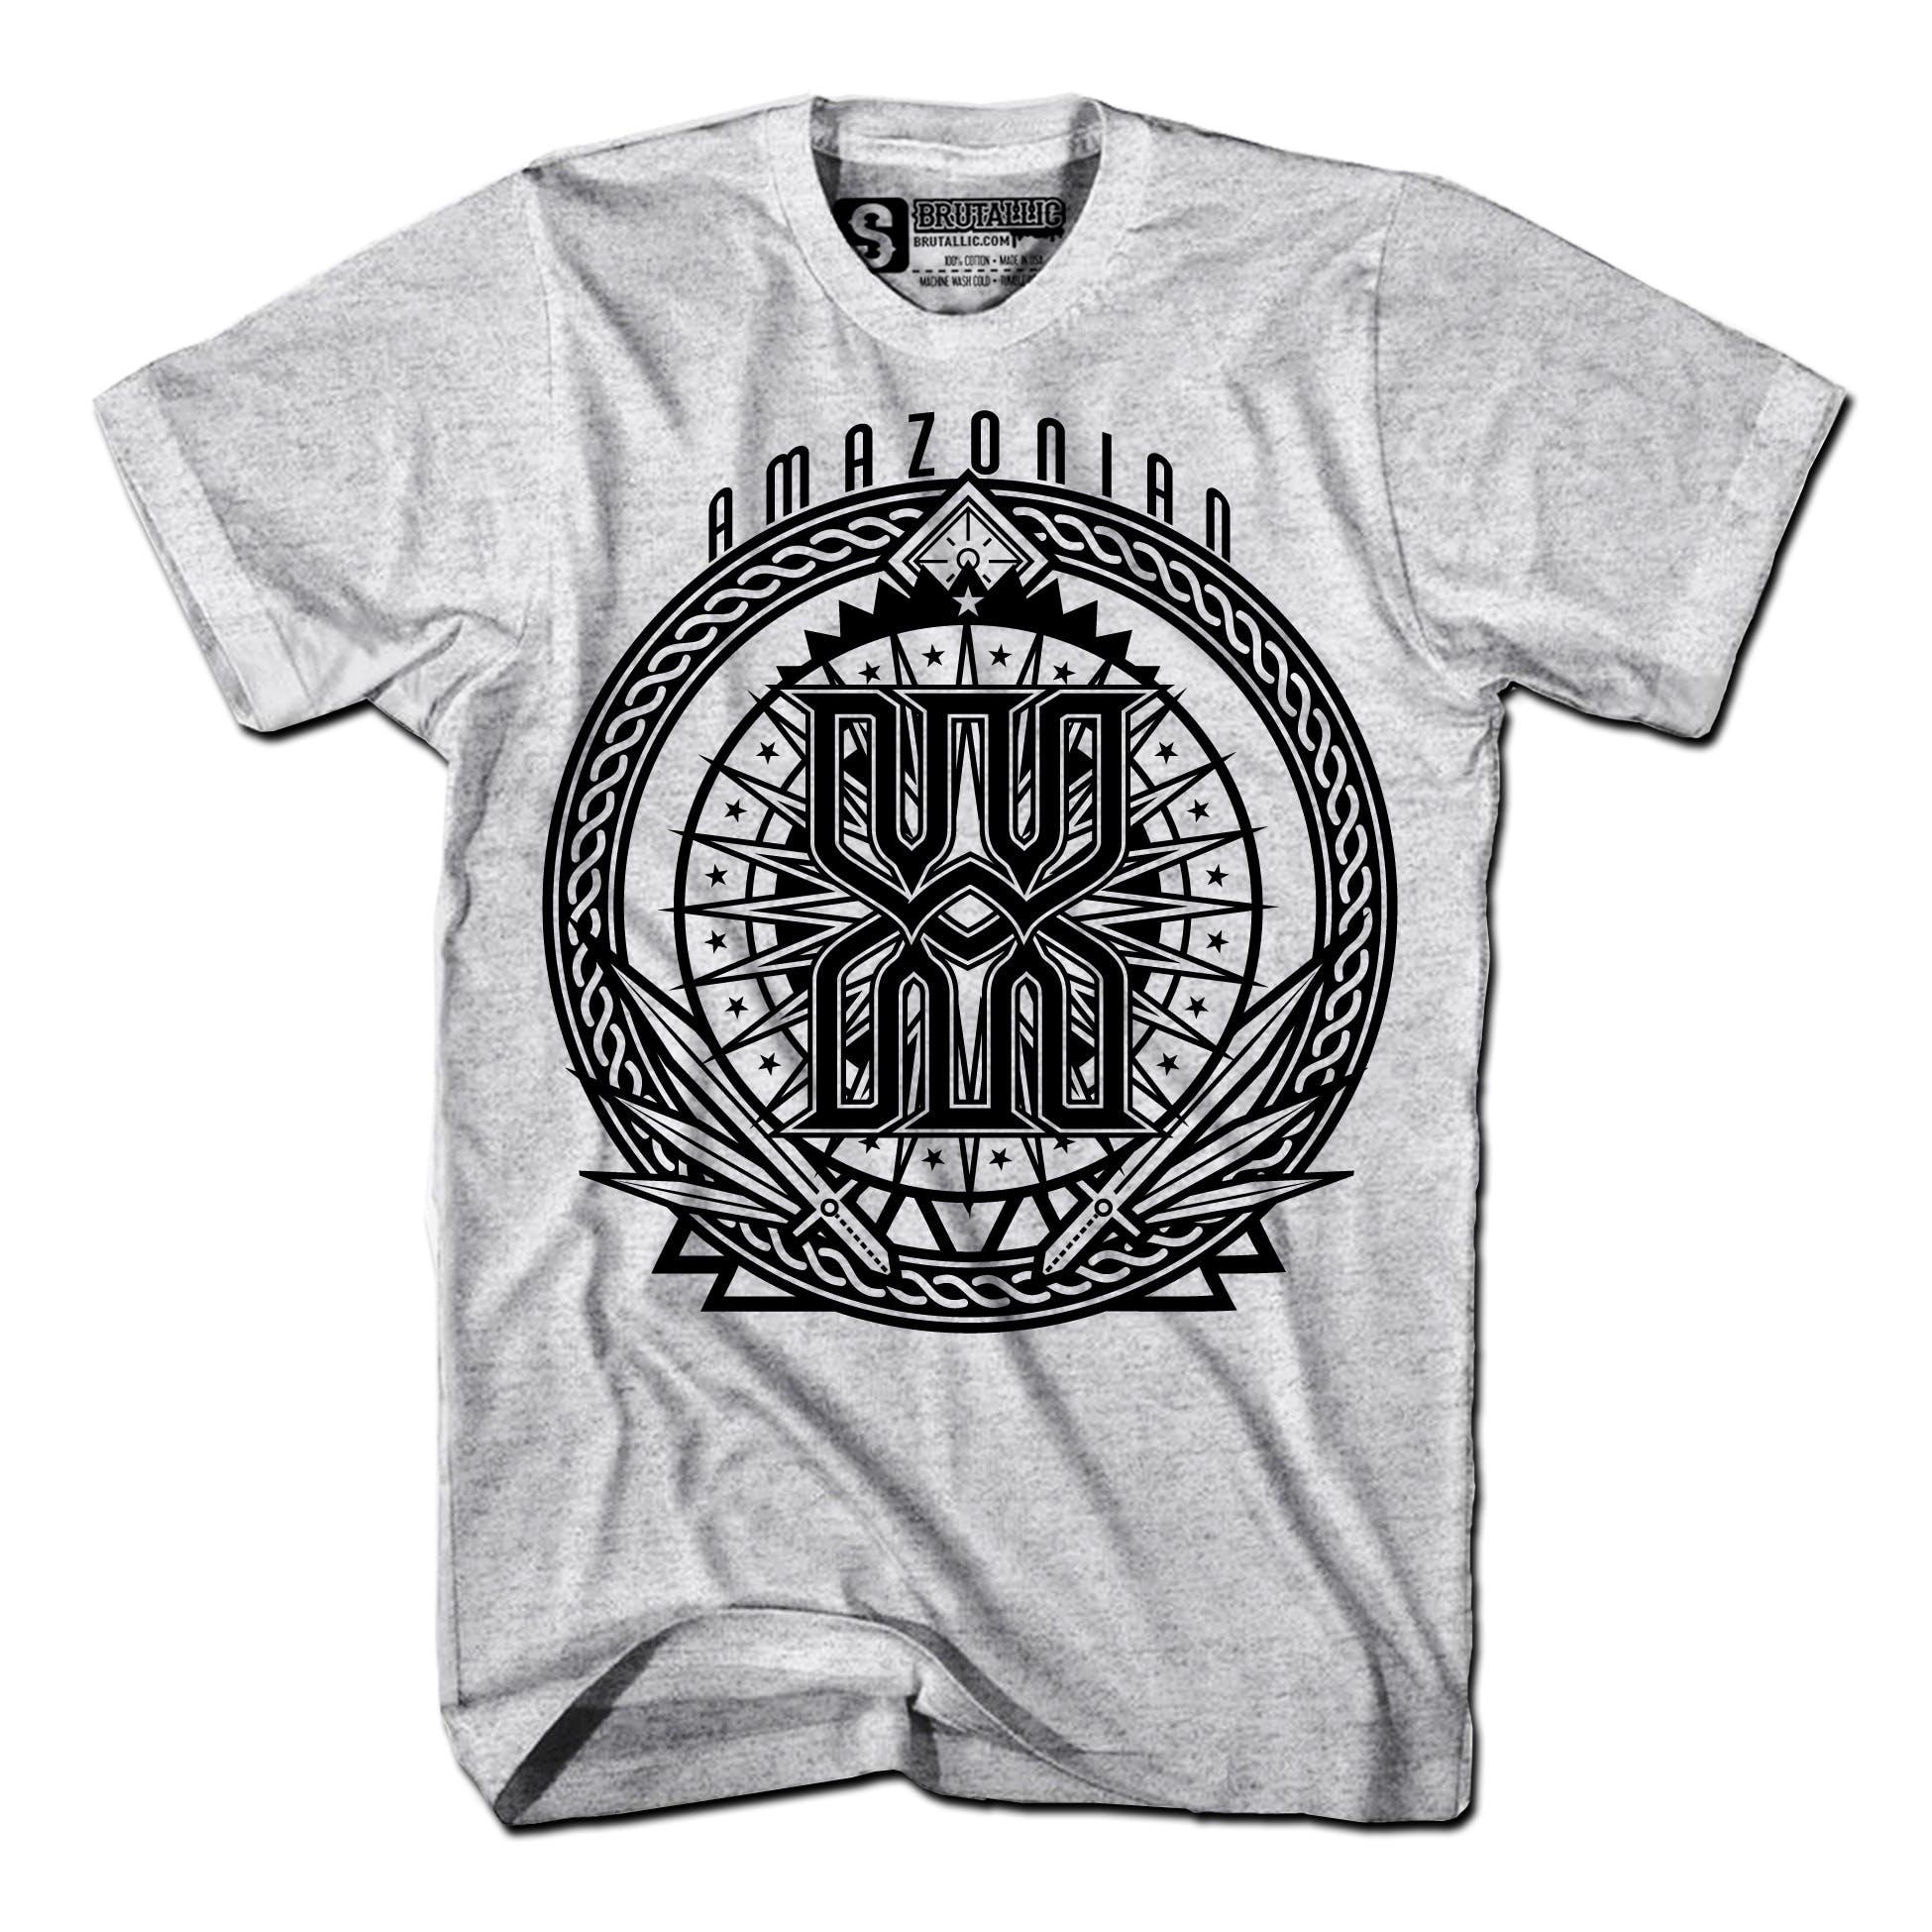 New t-shirt designs from New York brand Brutallic